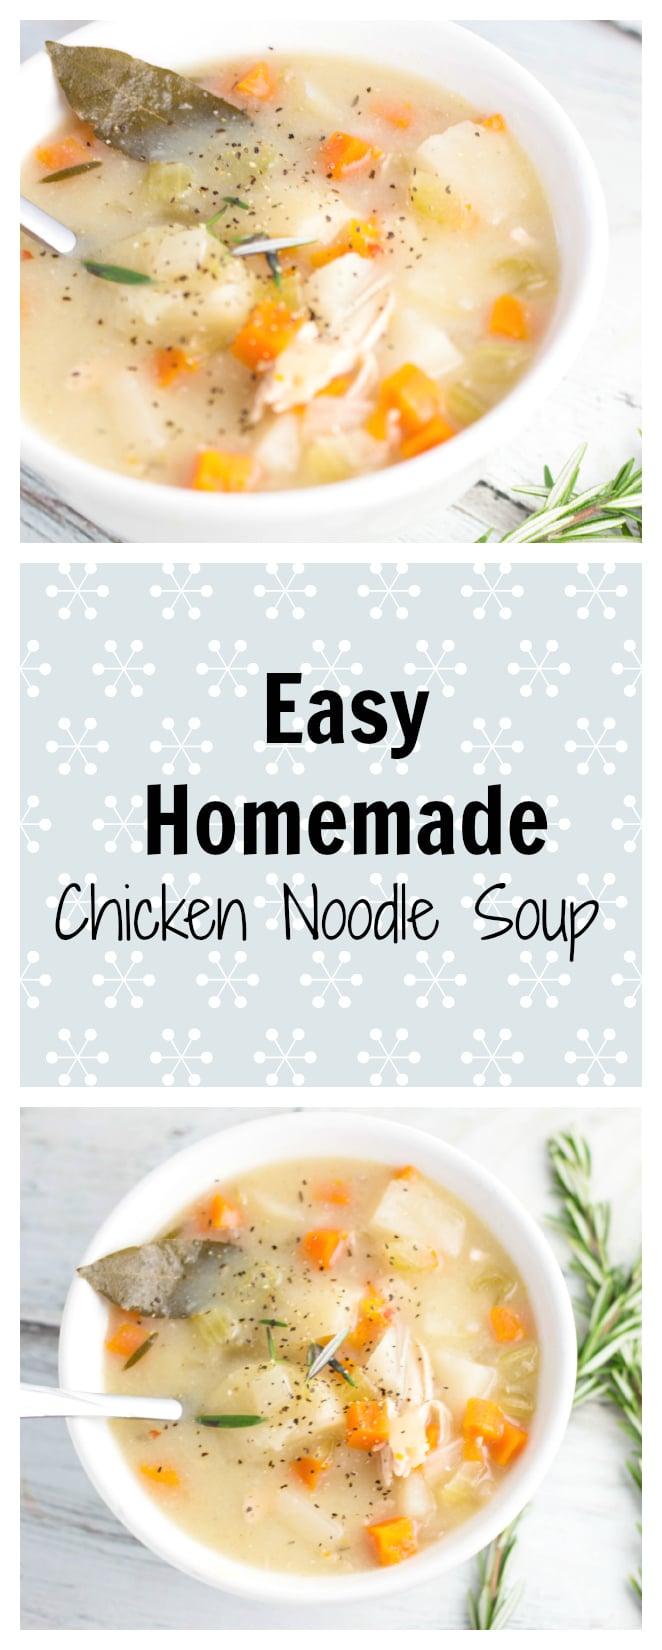 Easy Homemade Chicken Noodle Soup. The perfect winter soup! Krollskorner.com